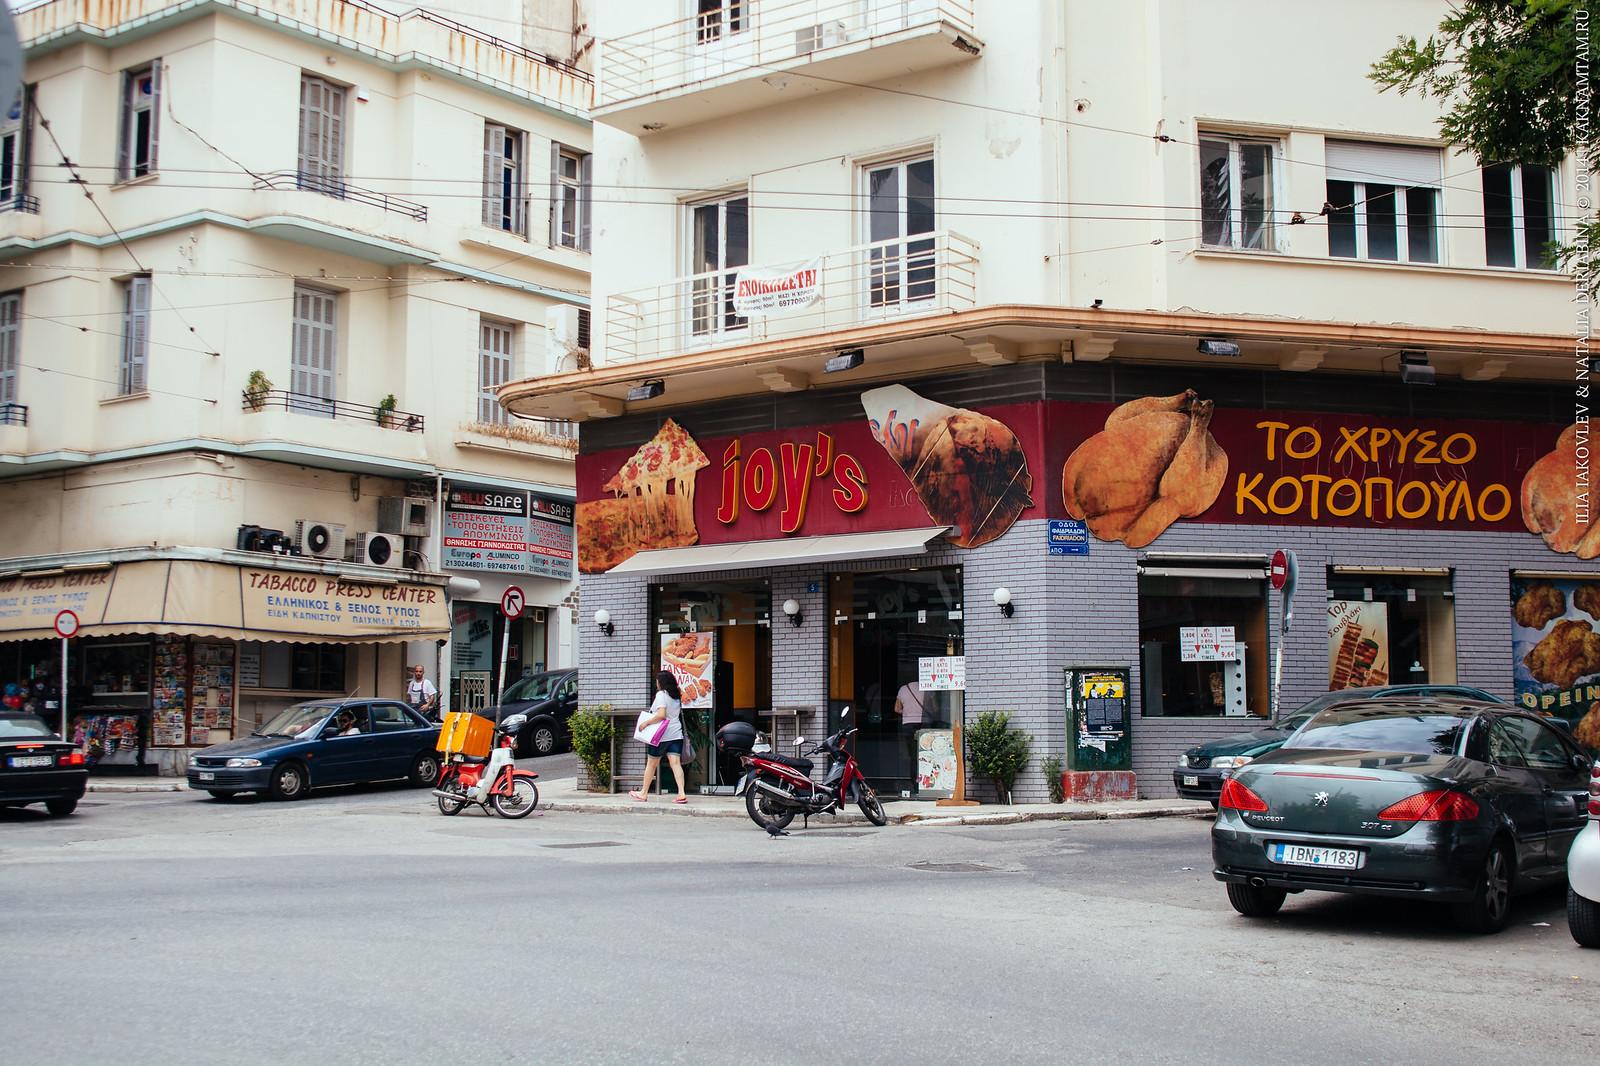 20140618-006-Athens.jpg